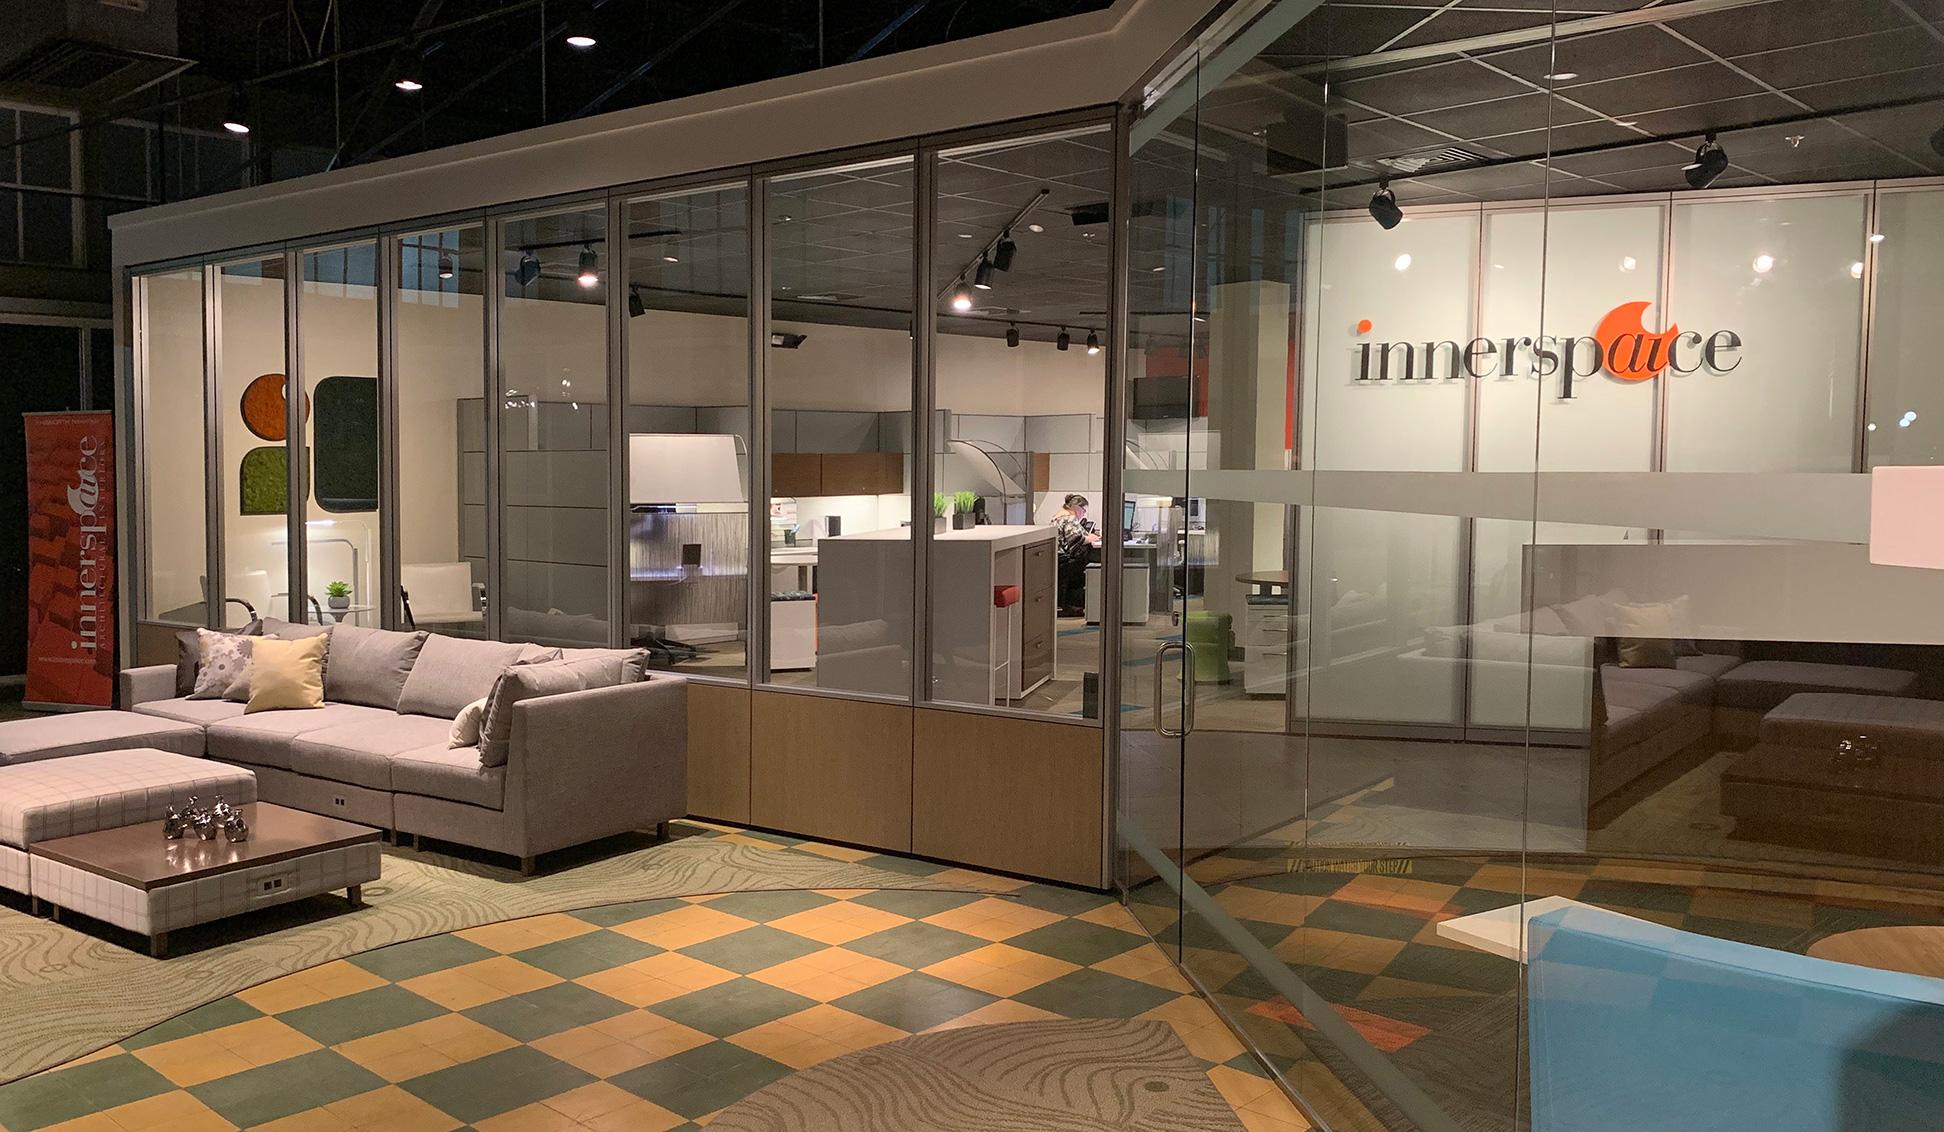 Innerspaice Mobile Showroom interior